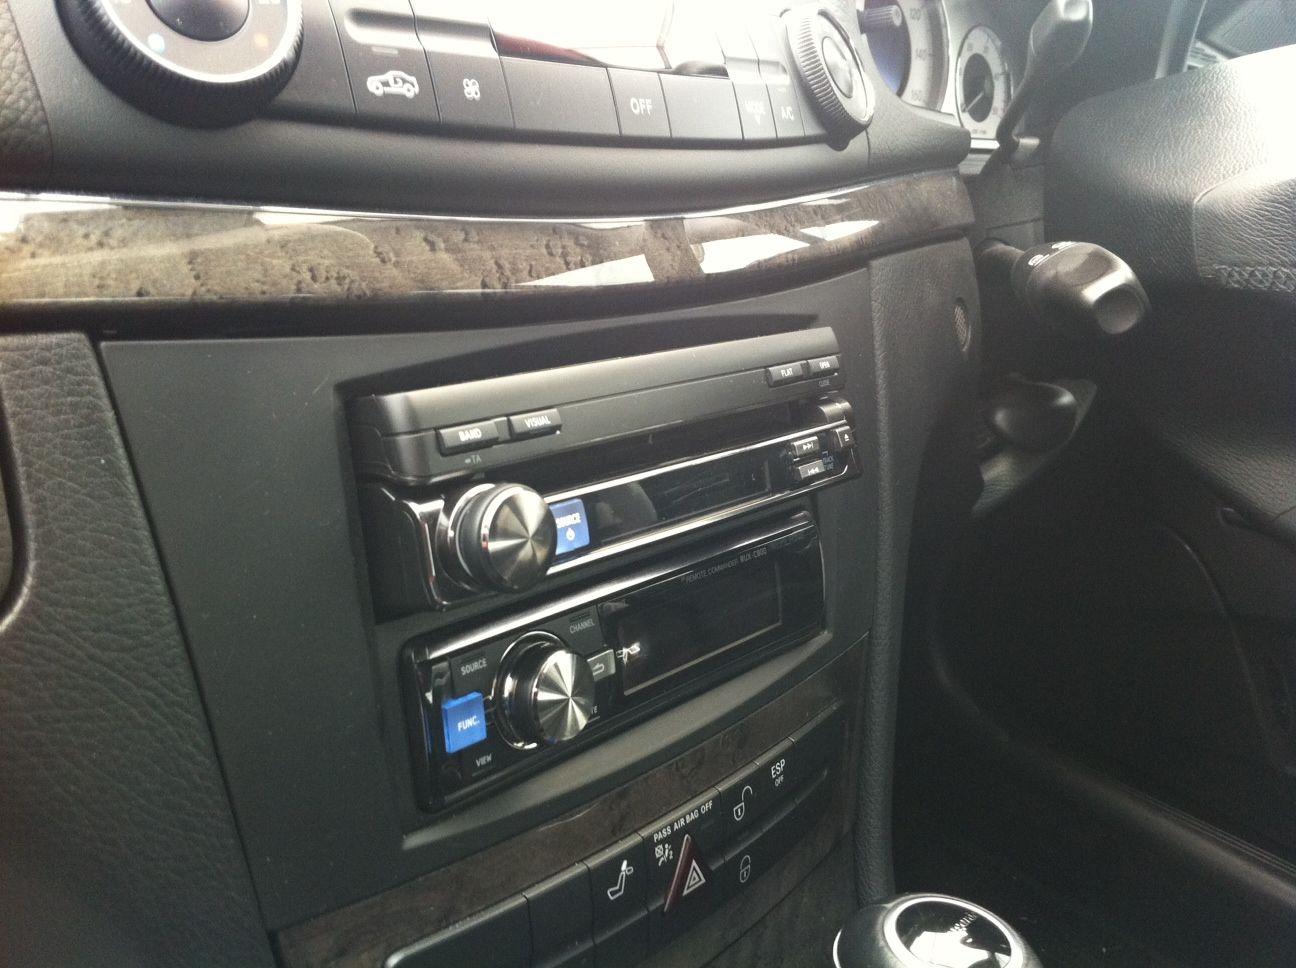 Iva D800r And Pxa H800 Rux C800 In A Mercedes E Class